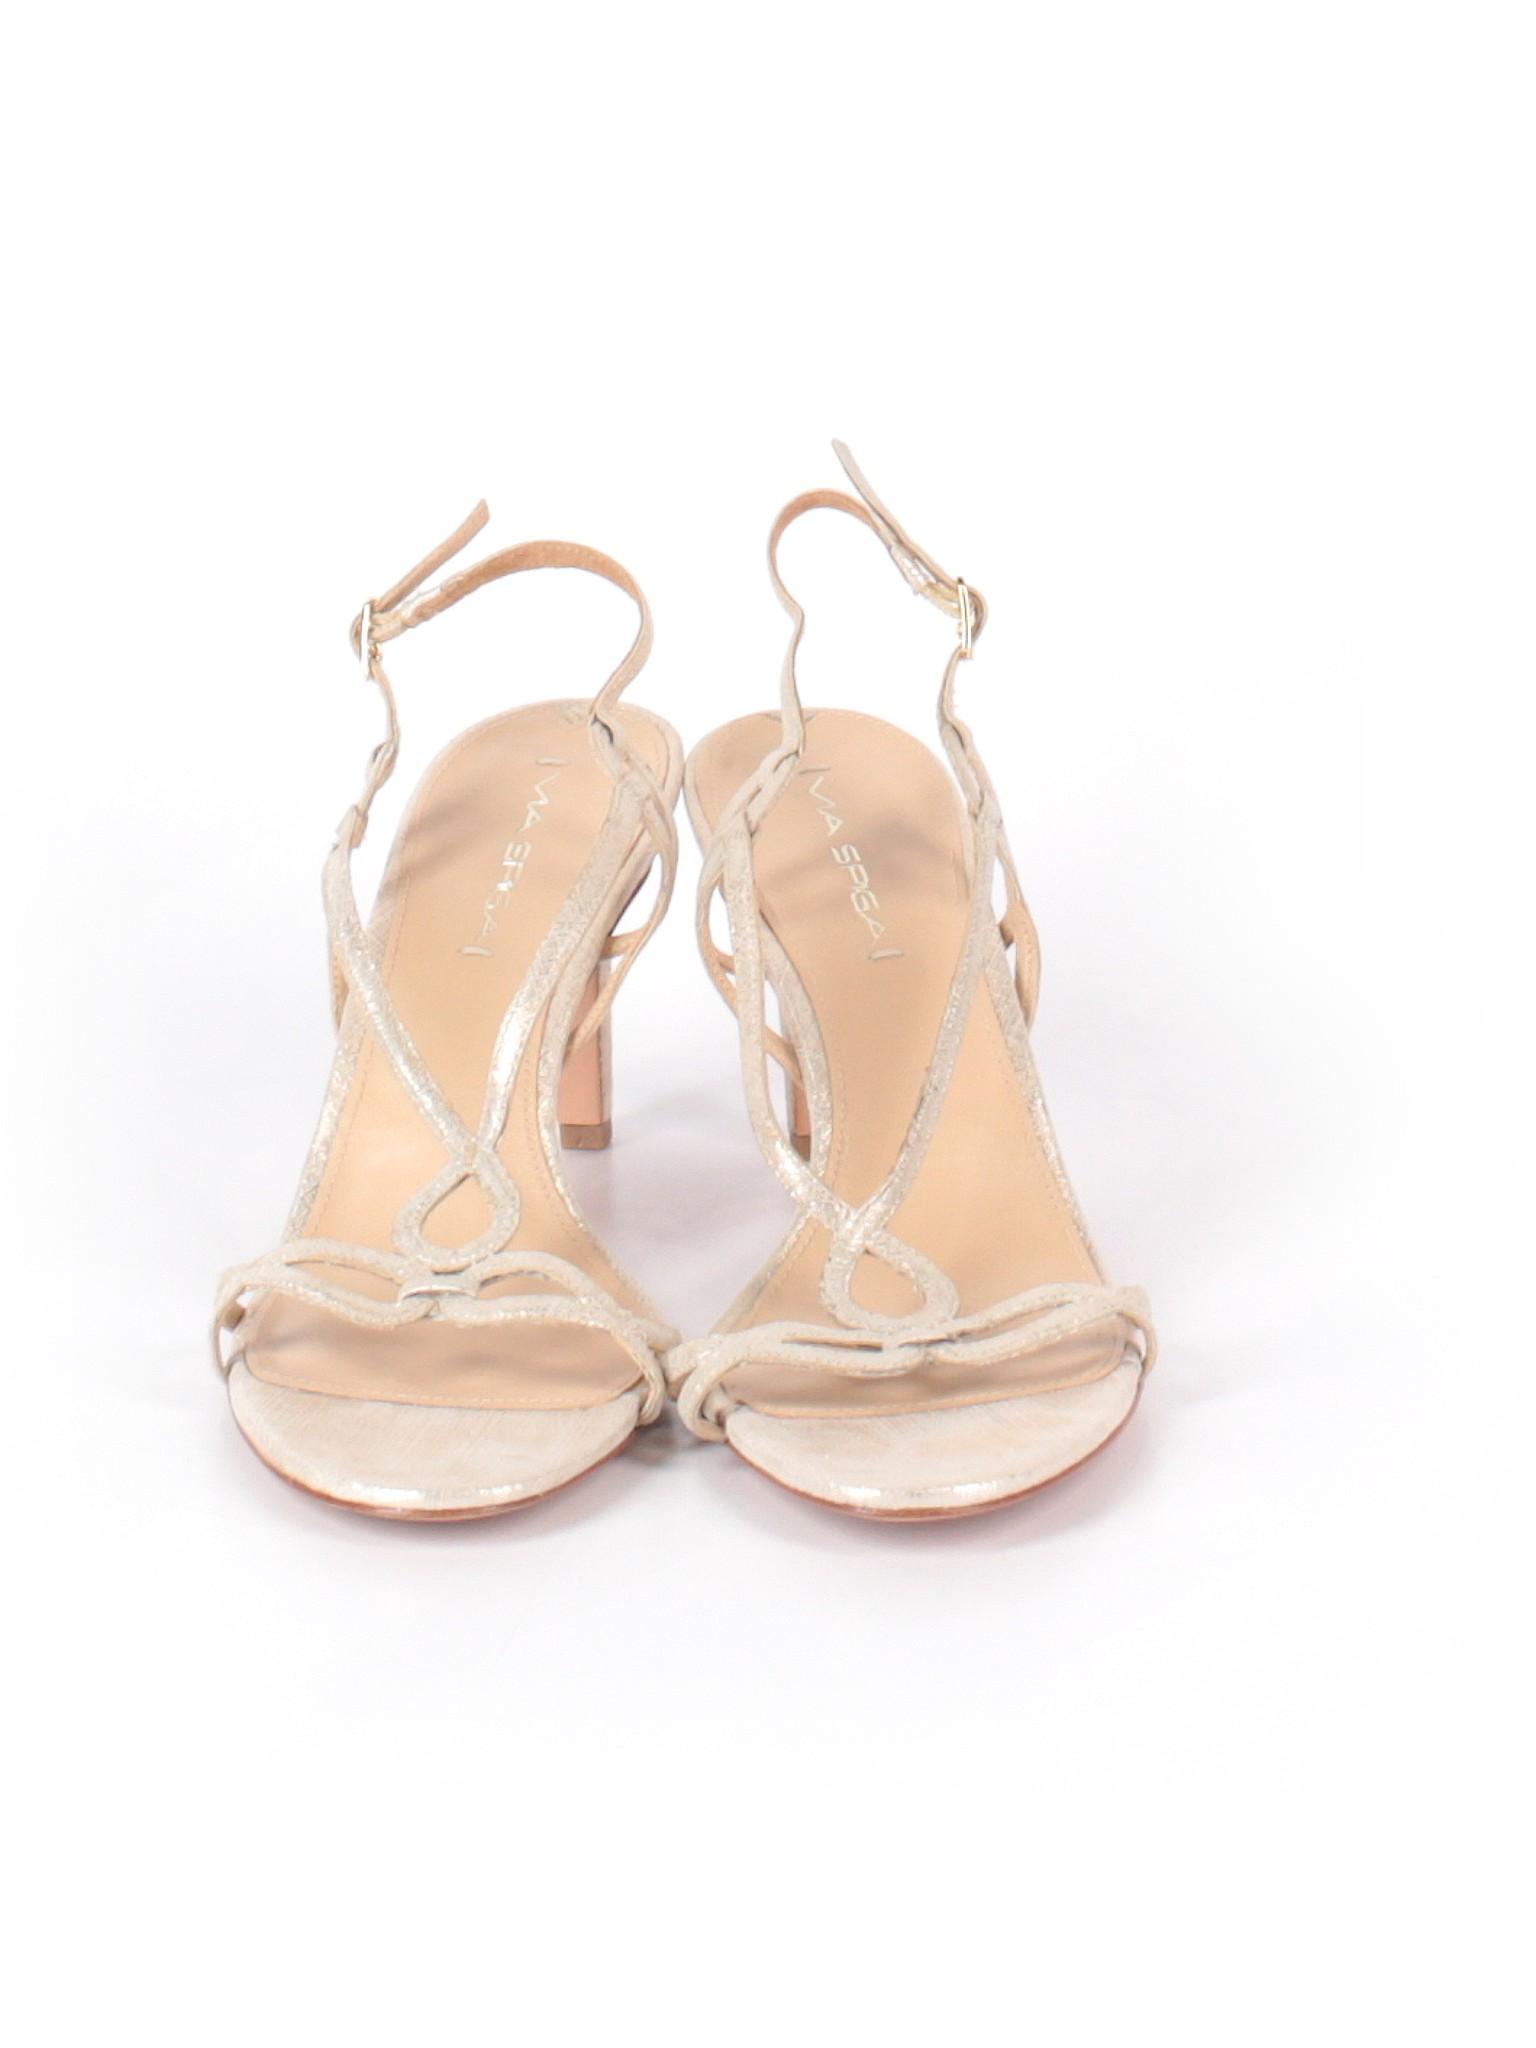 Spiga promotion Heels Via Via Boutique promotion Boutique Spiga promotion Boutique Spiga Heels promotion Via Via Boutique Heels T8OxAFTq